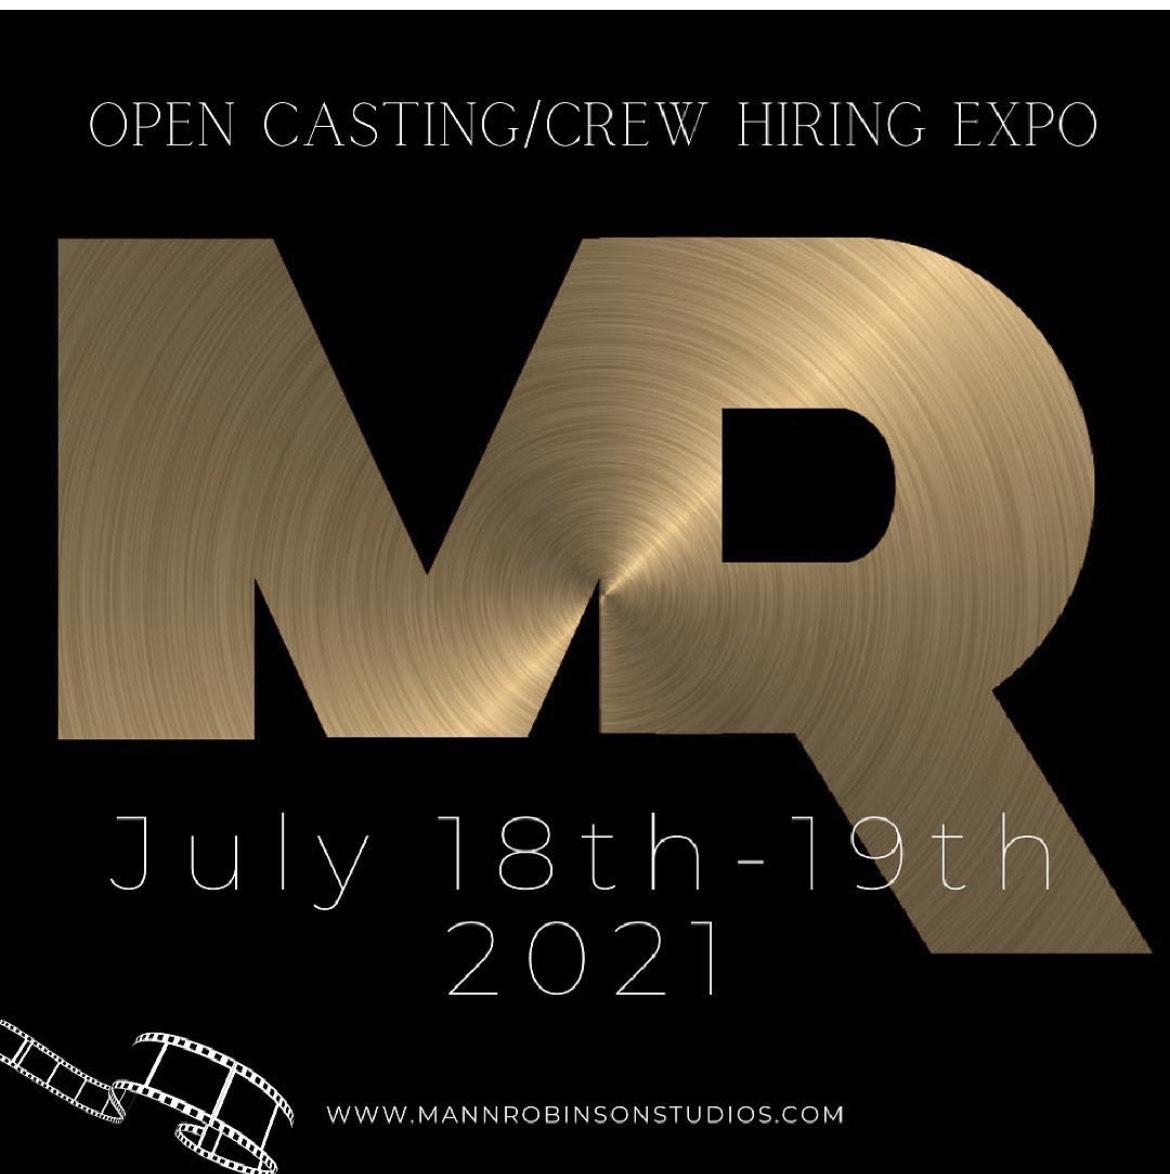 Mann Robinson Studios Casting Call and Crew Expo